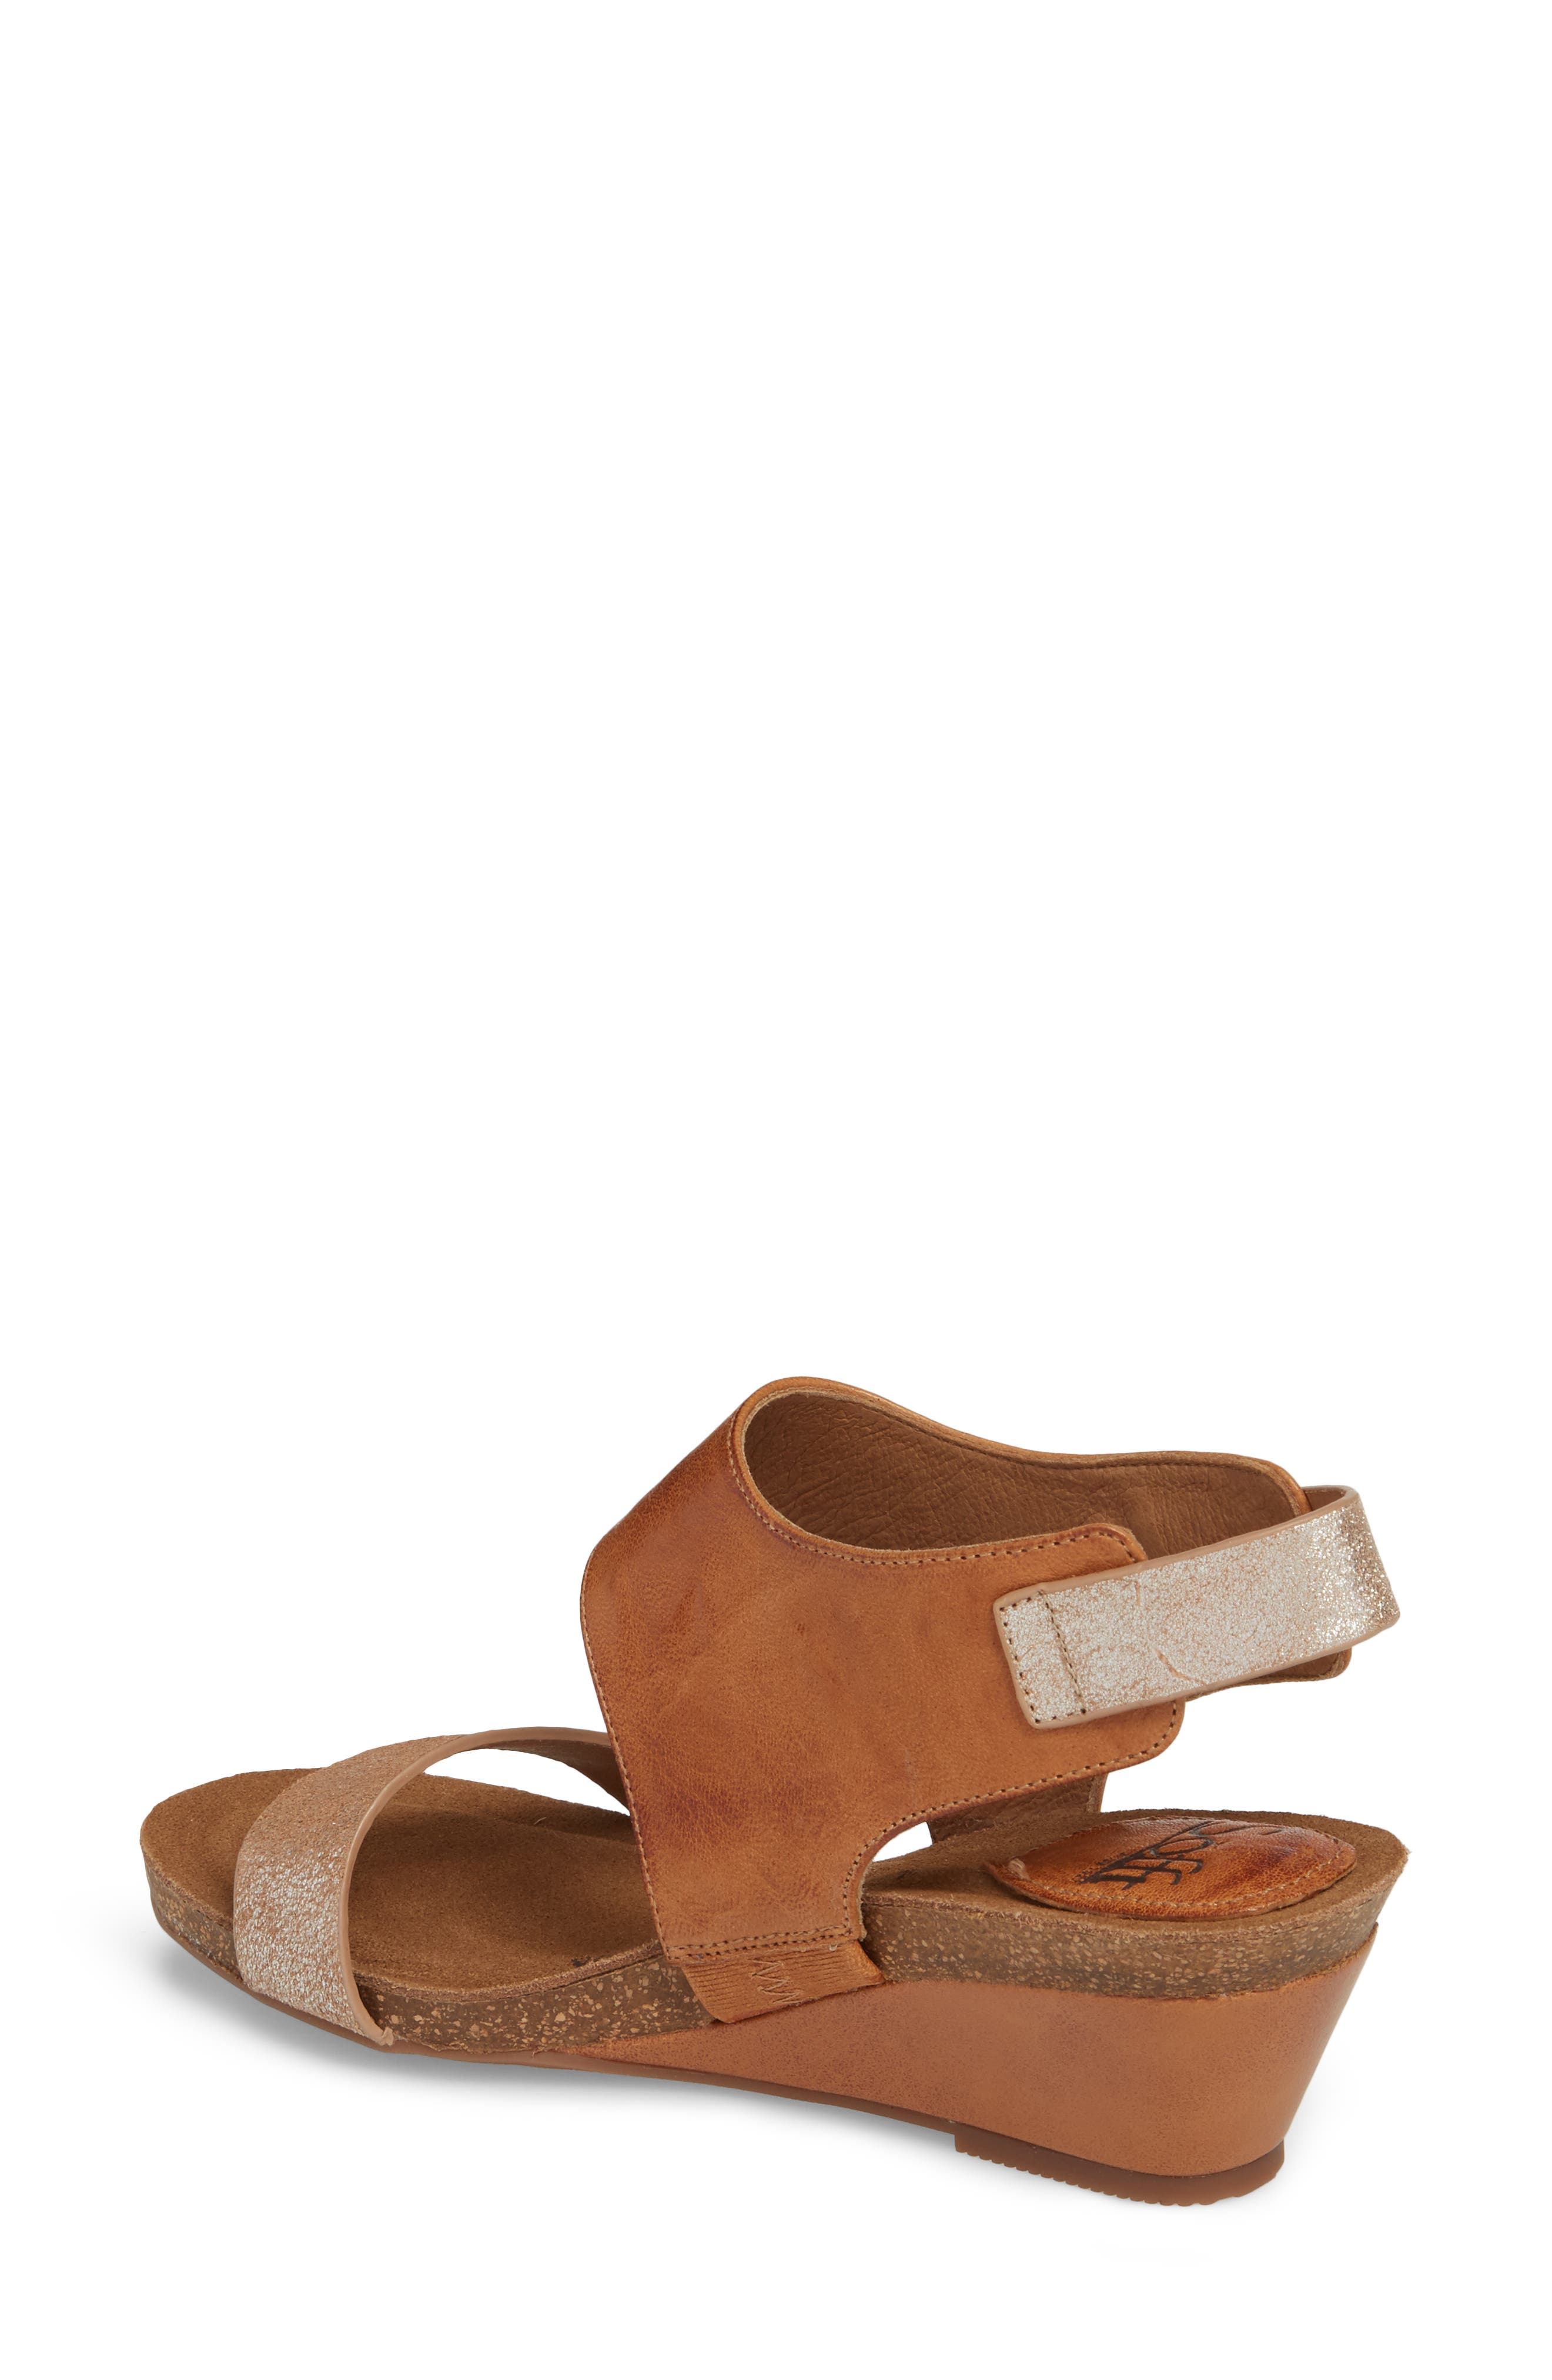 ,                             'Vanita' Leather Sandal,                             Alternate thumbnail 2, color,                             LUGGAGE/ SILVER LEATHER